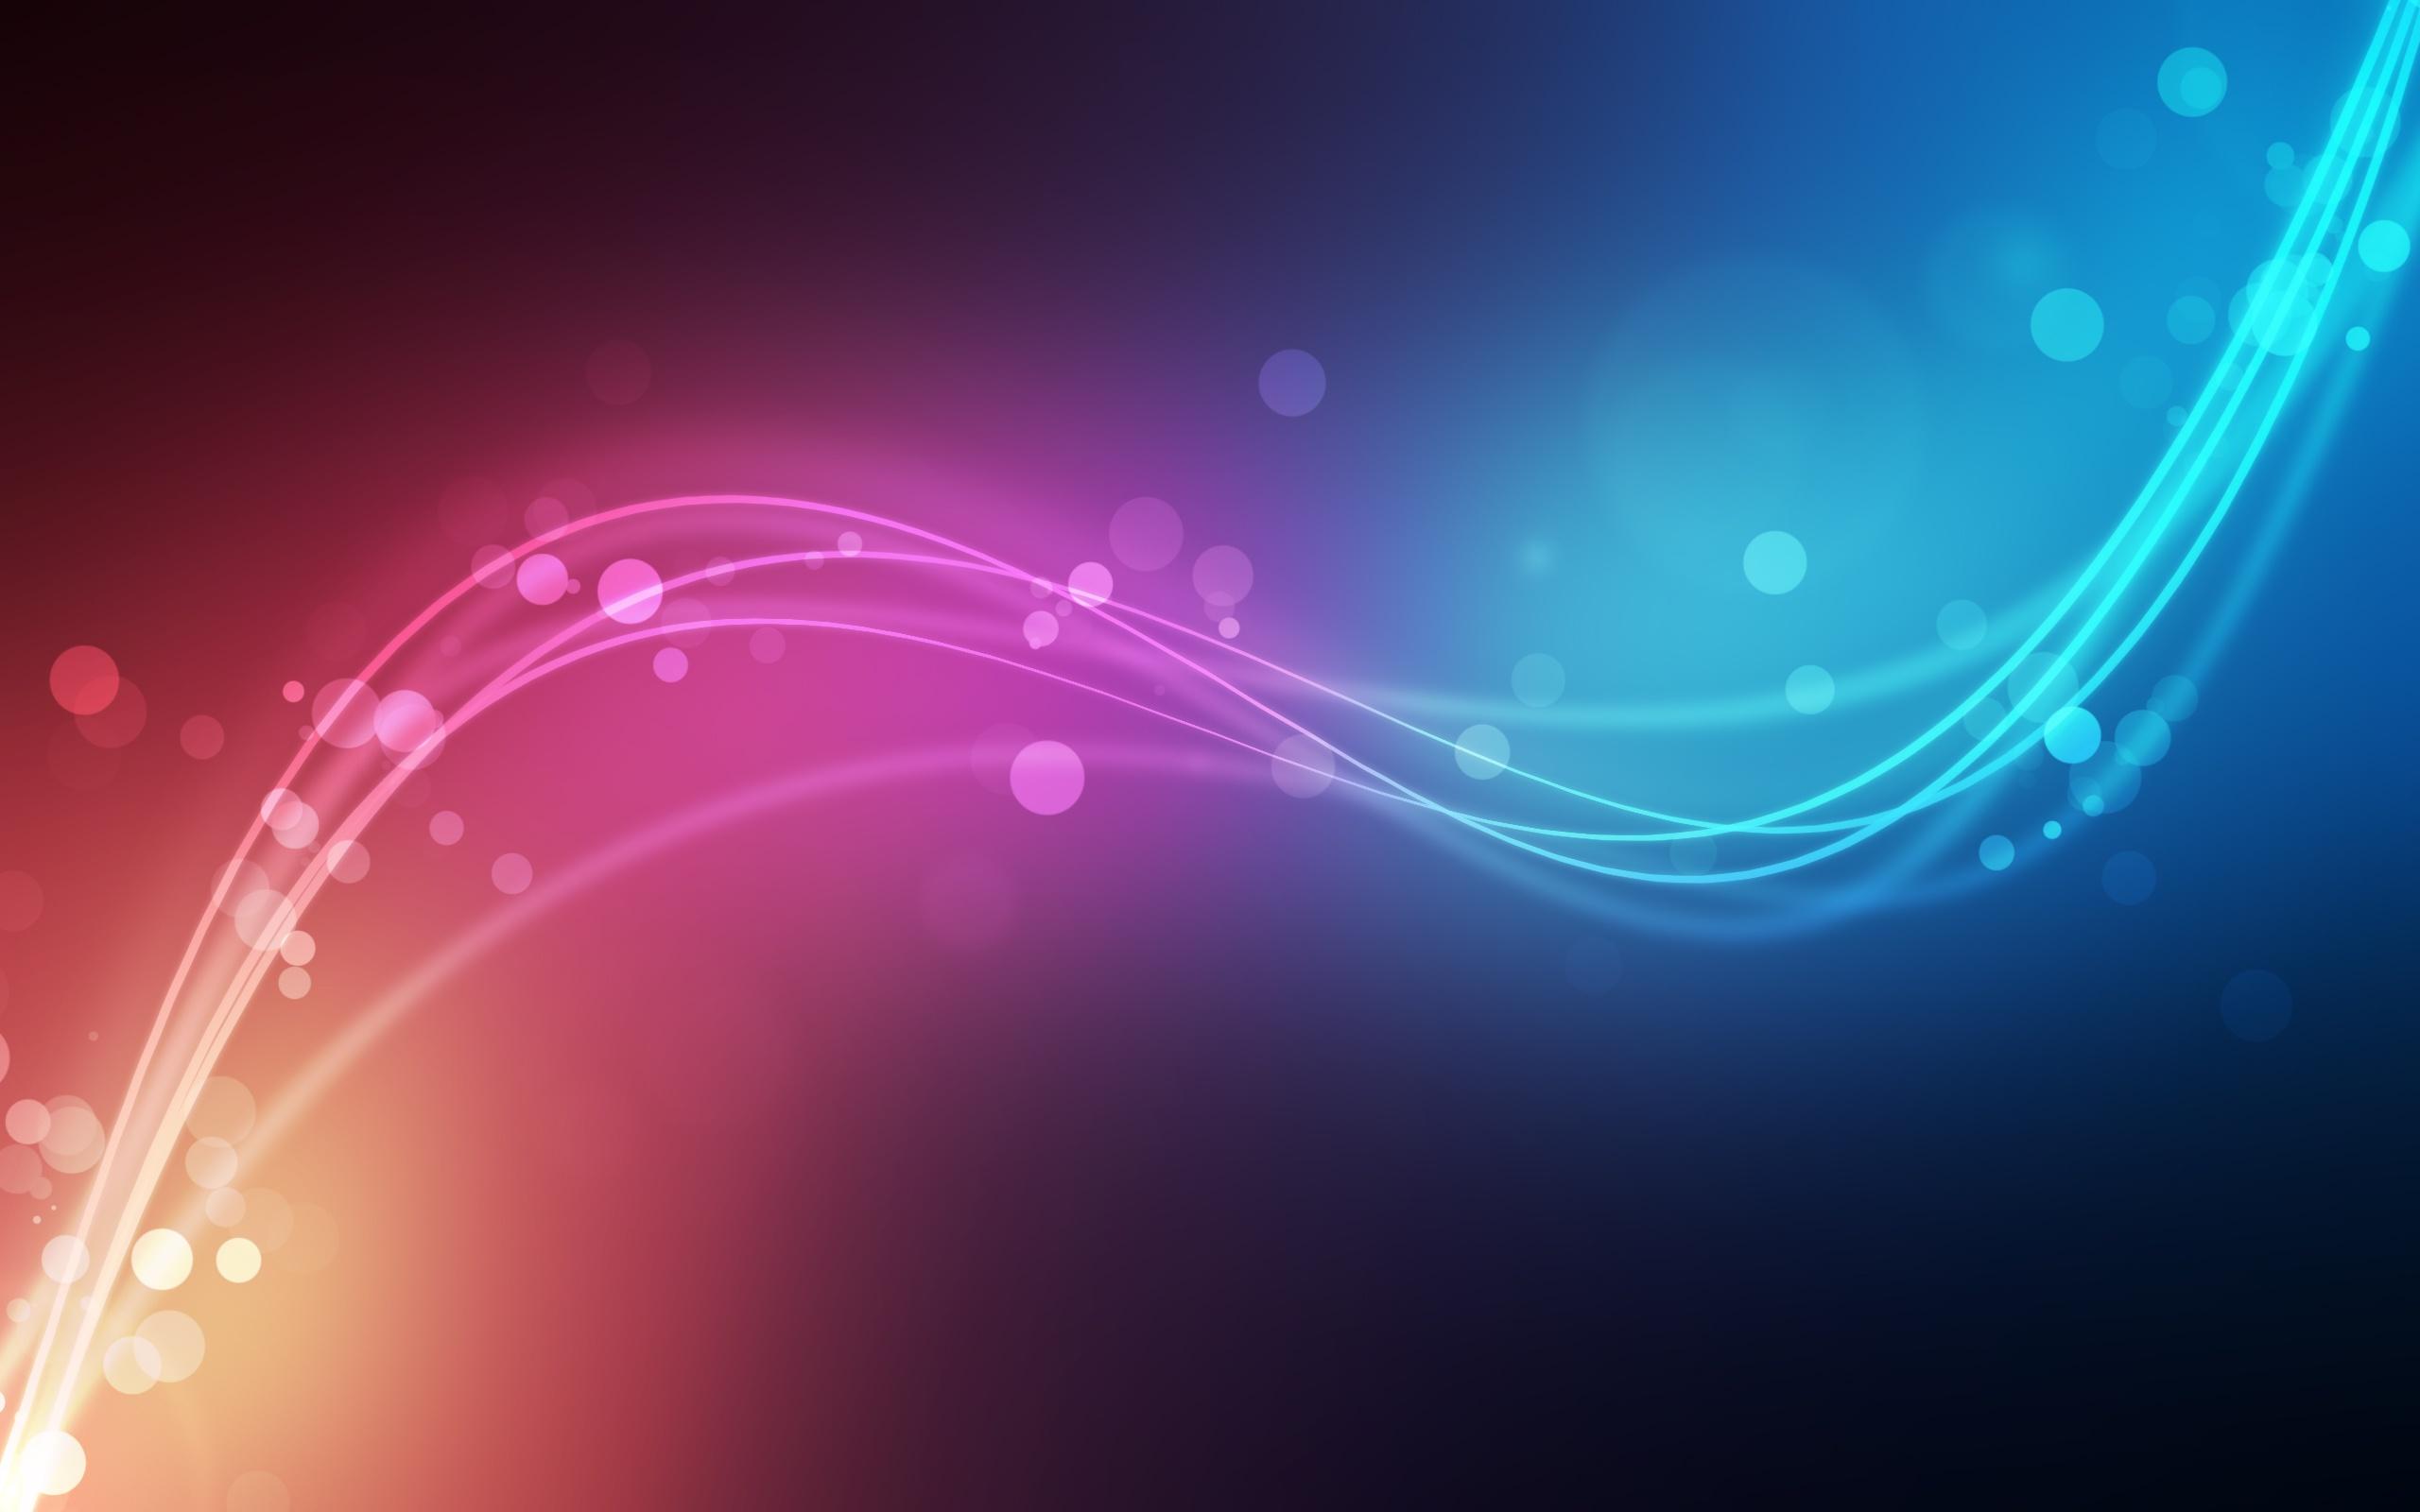 Digital Waves 2560 x 1600 2560x1600